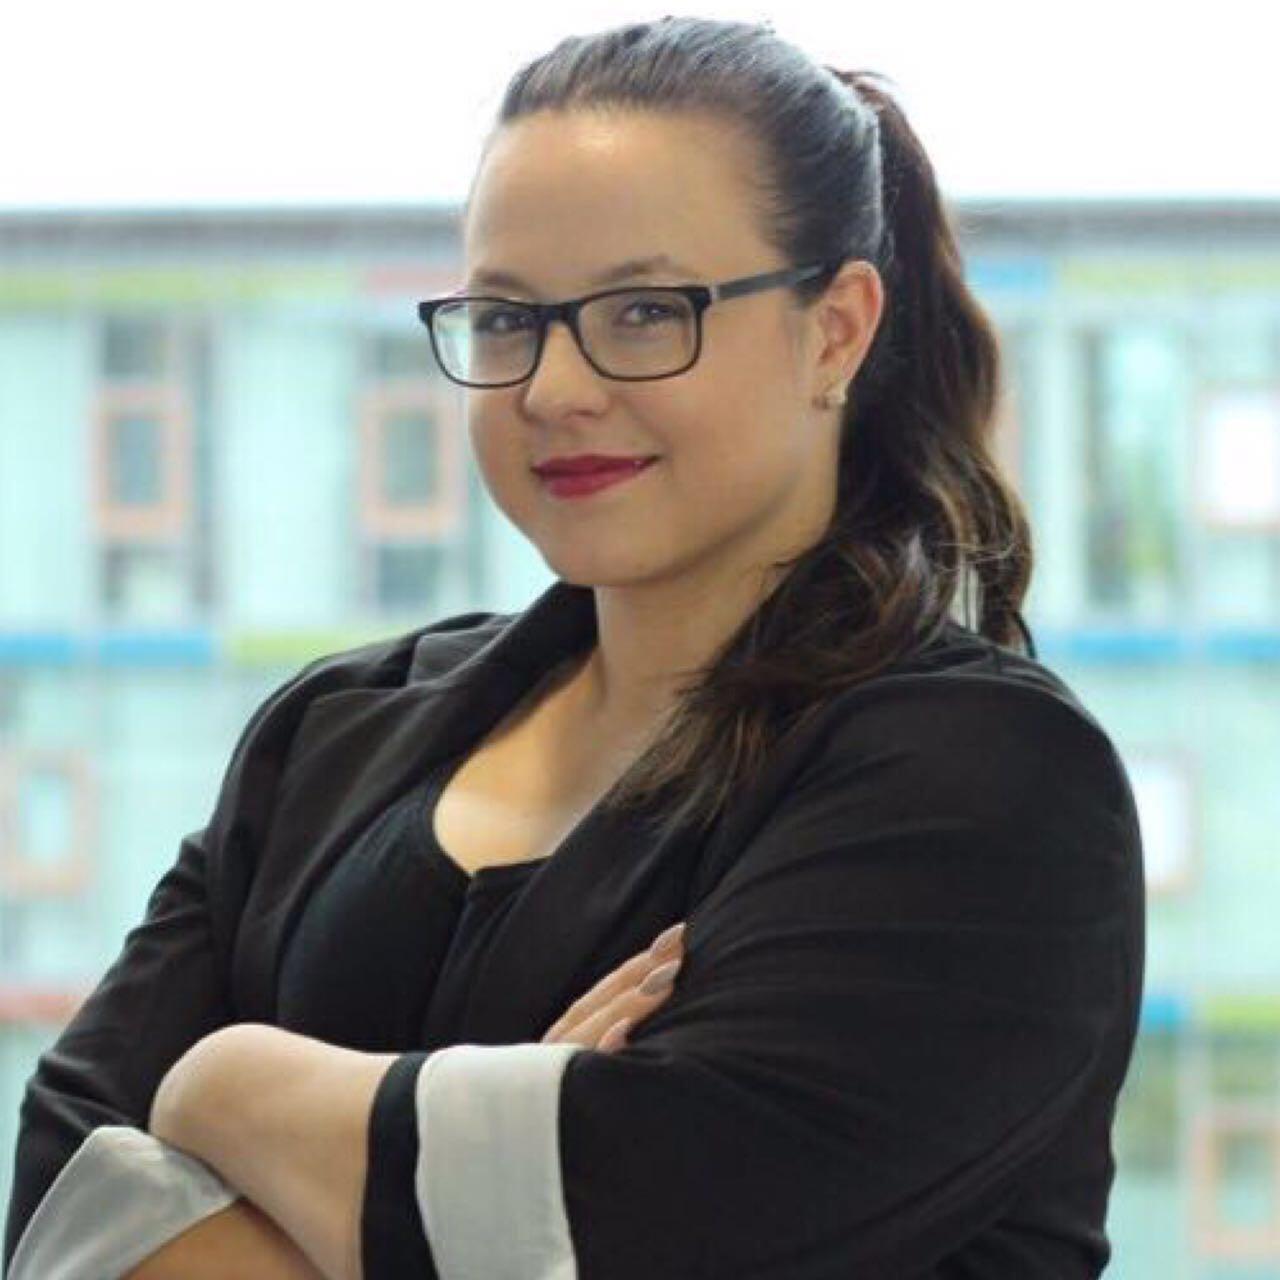 Daniela Plener